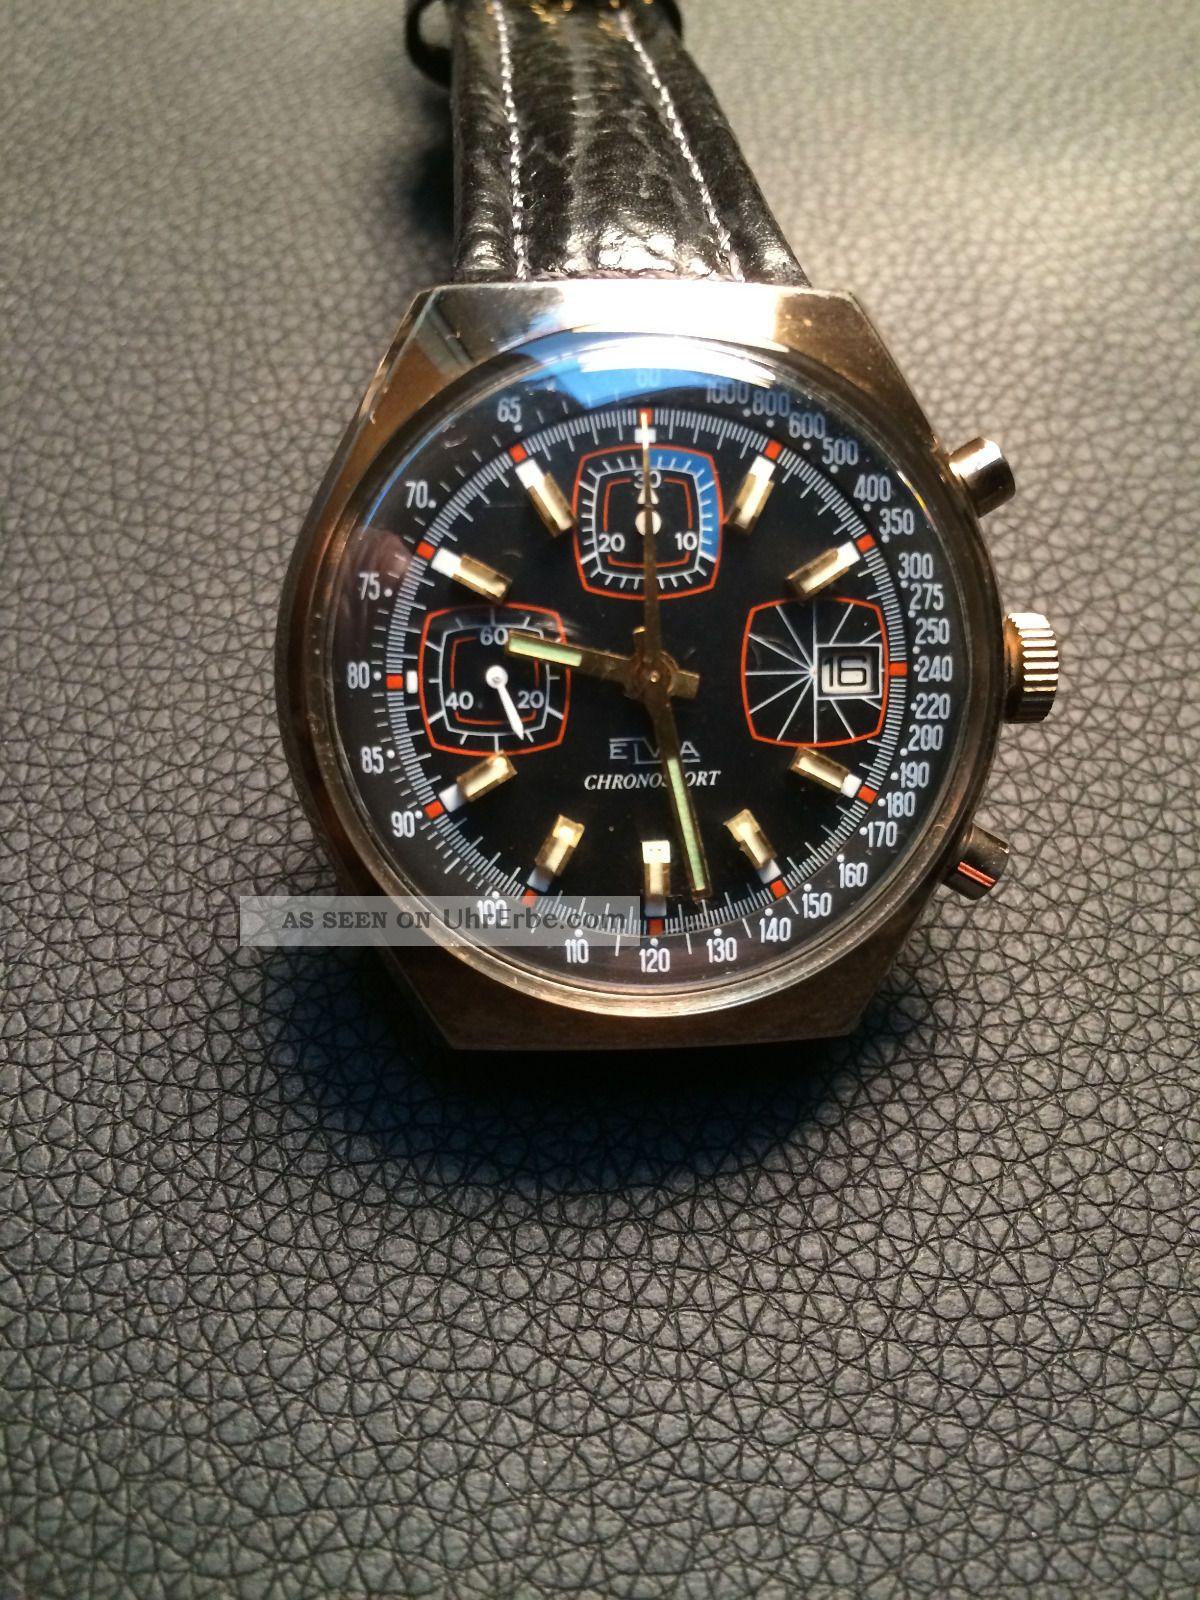 Elvia Chronosport Mit Datum Ca 60 / 70 Er Jahre Vergoldet Armbanduhren Bild